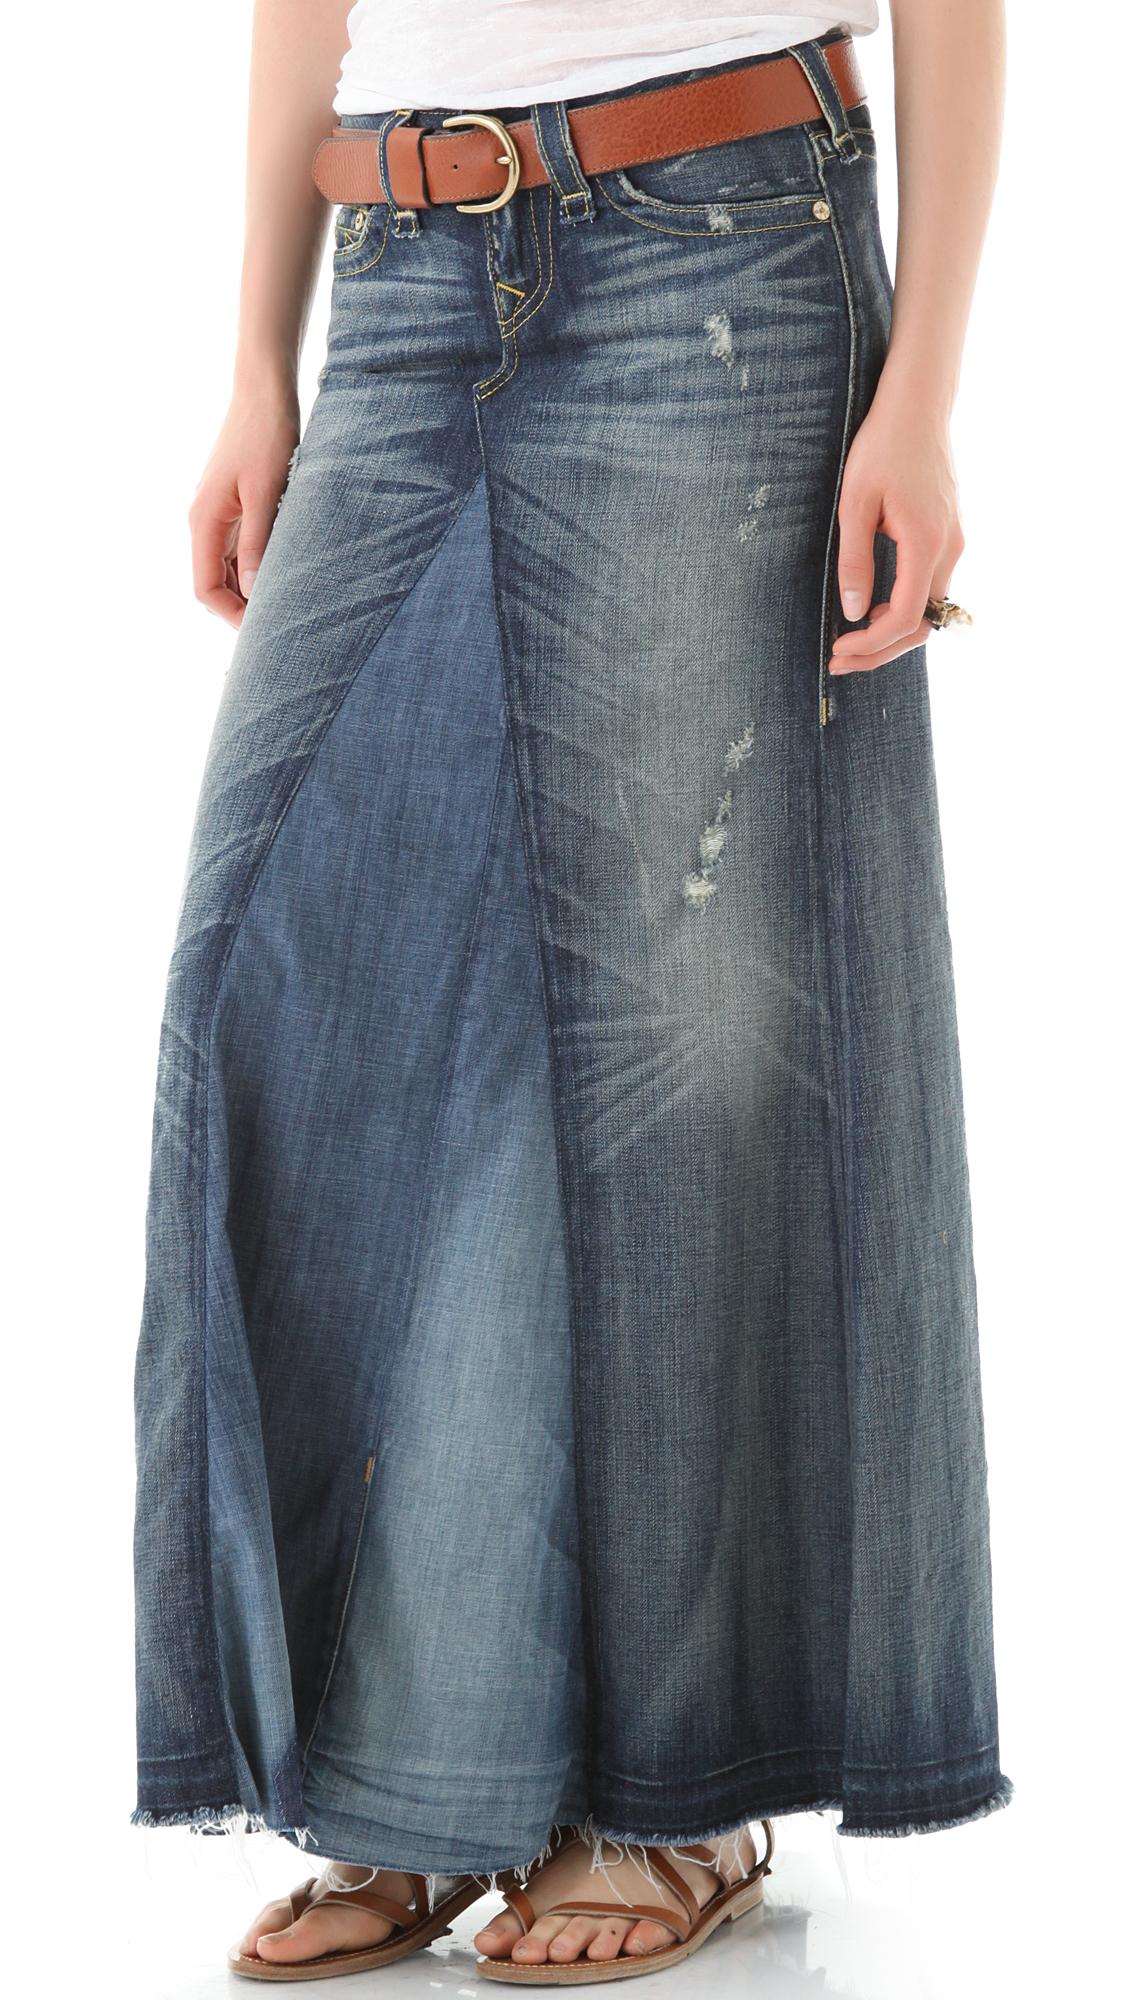 True Religion Dakota Denim Maxi Skirt | 15% off first app purchase ...